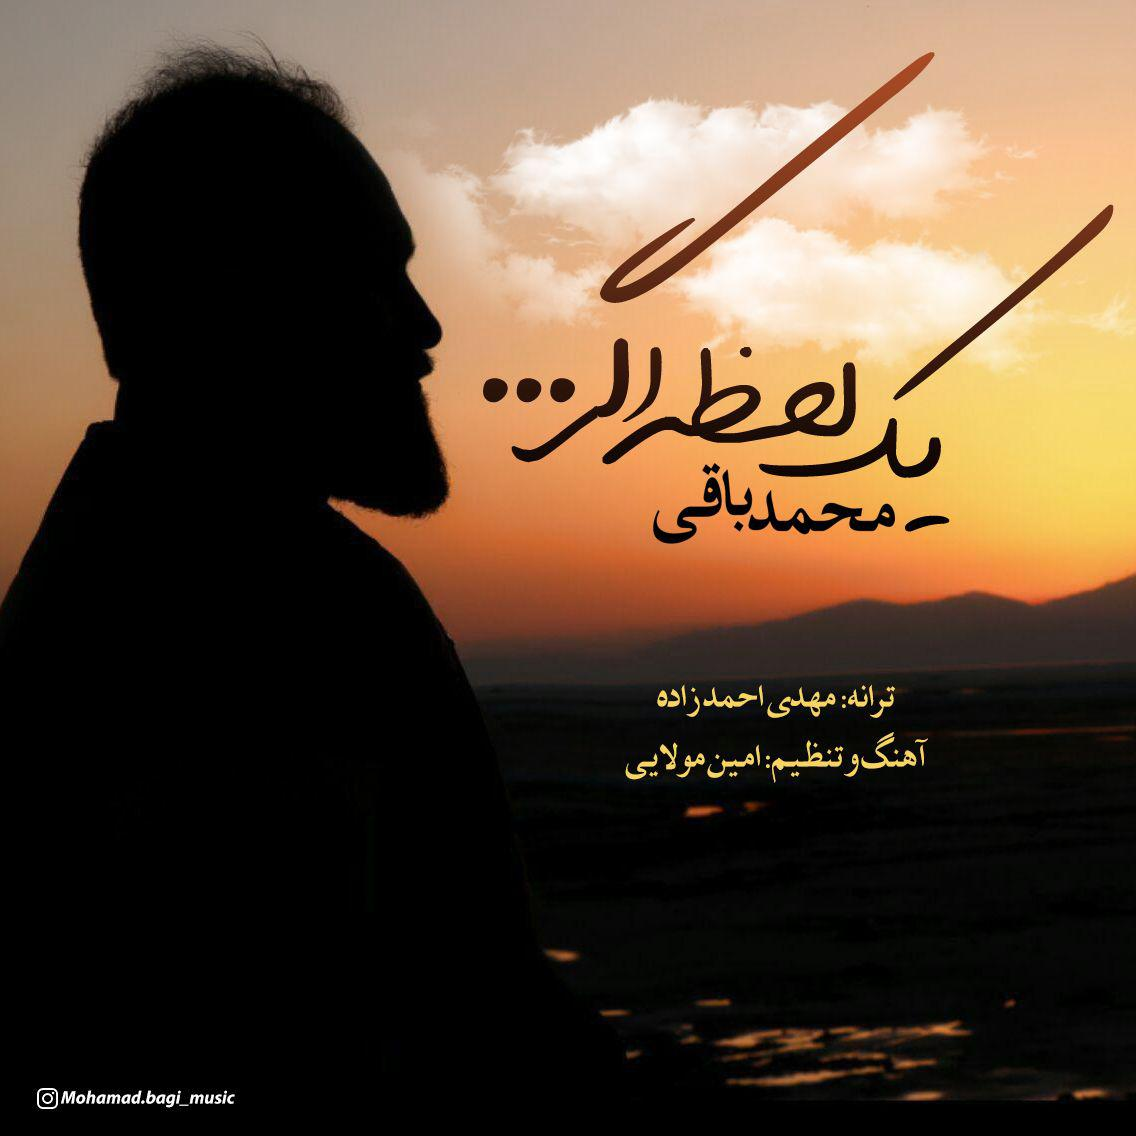 Mohammad Bagi – Yek Lahze Agar